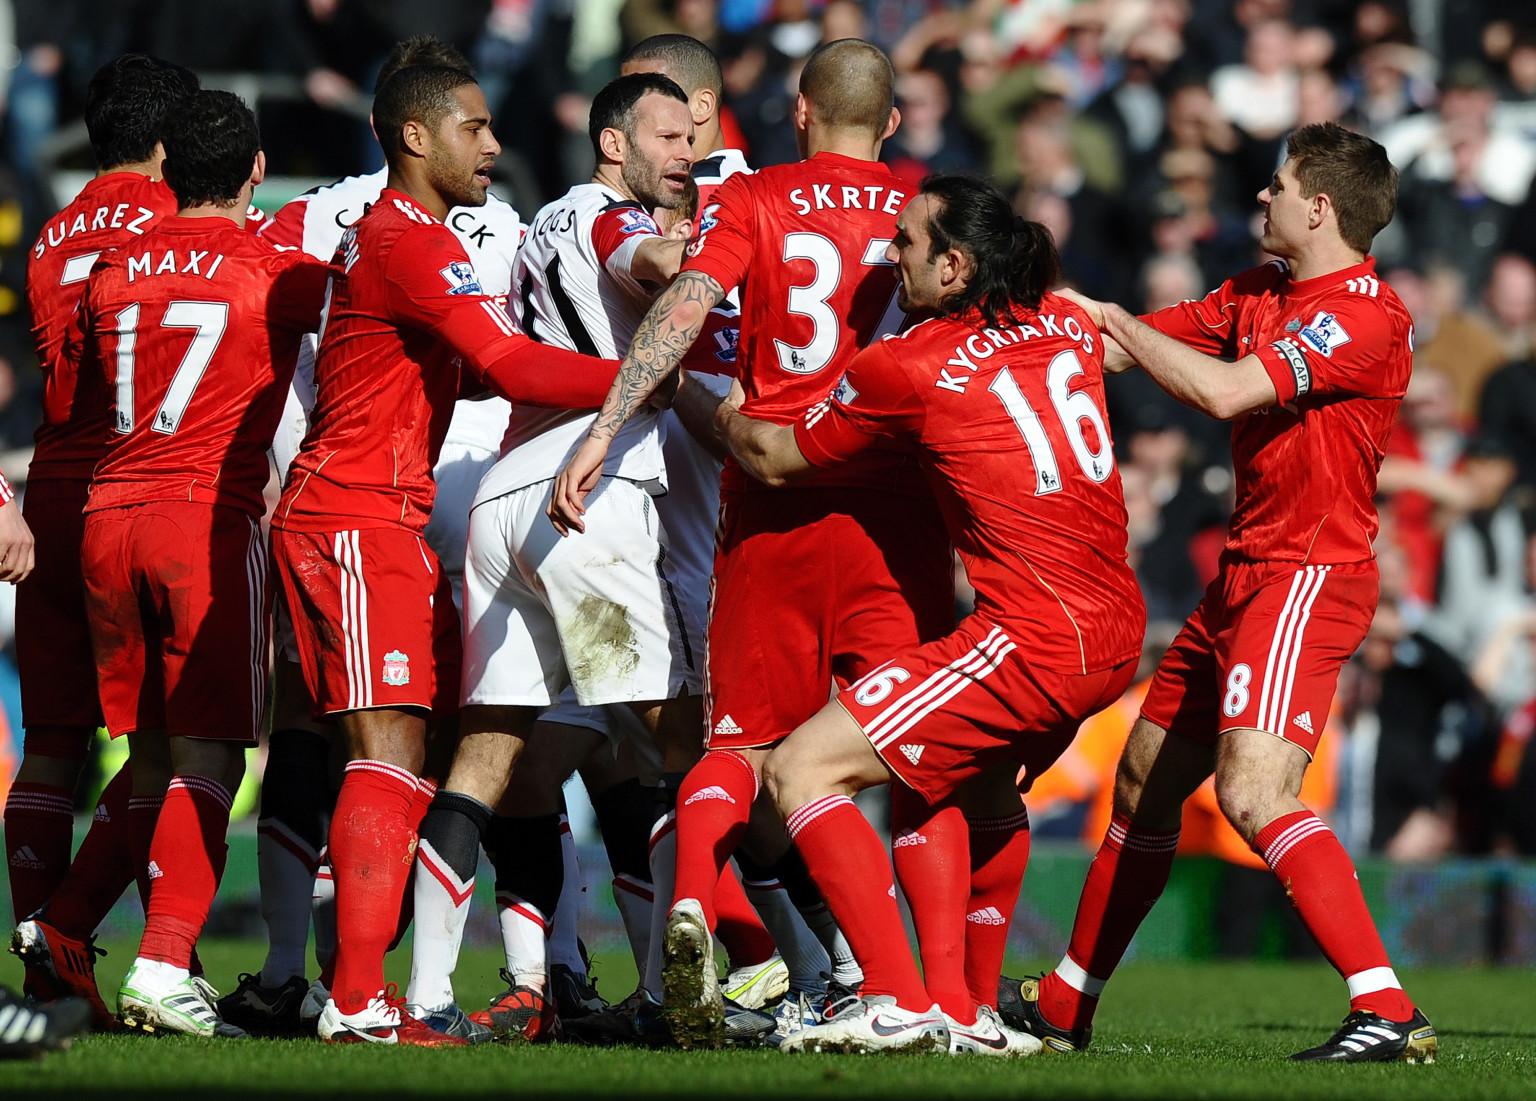 liverpool vs man united - photo #14